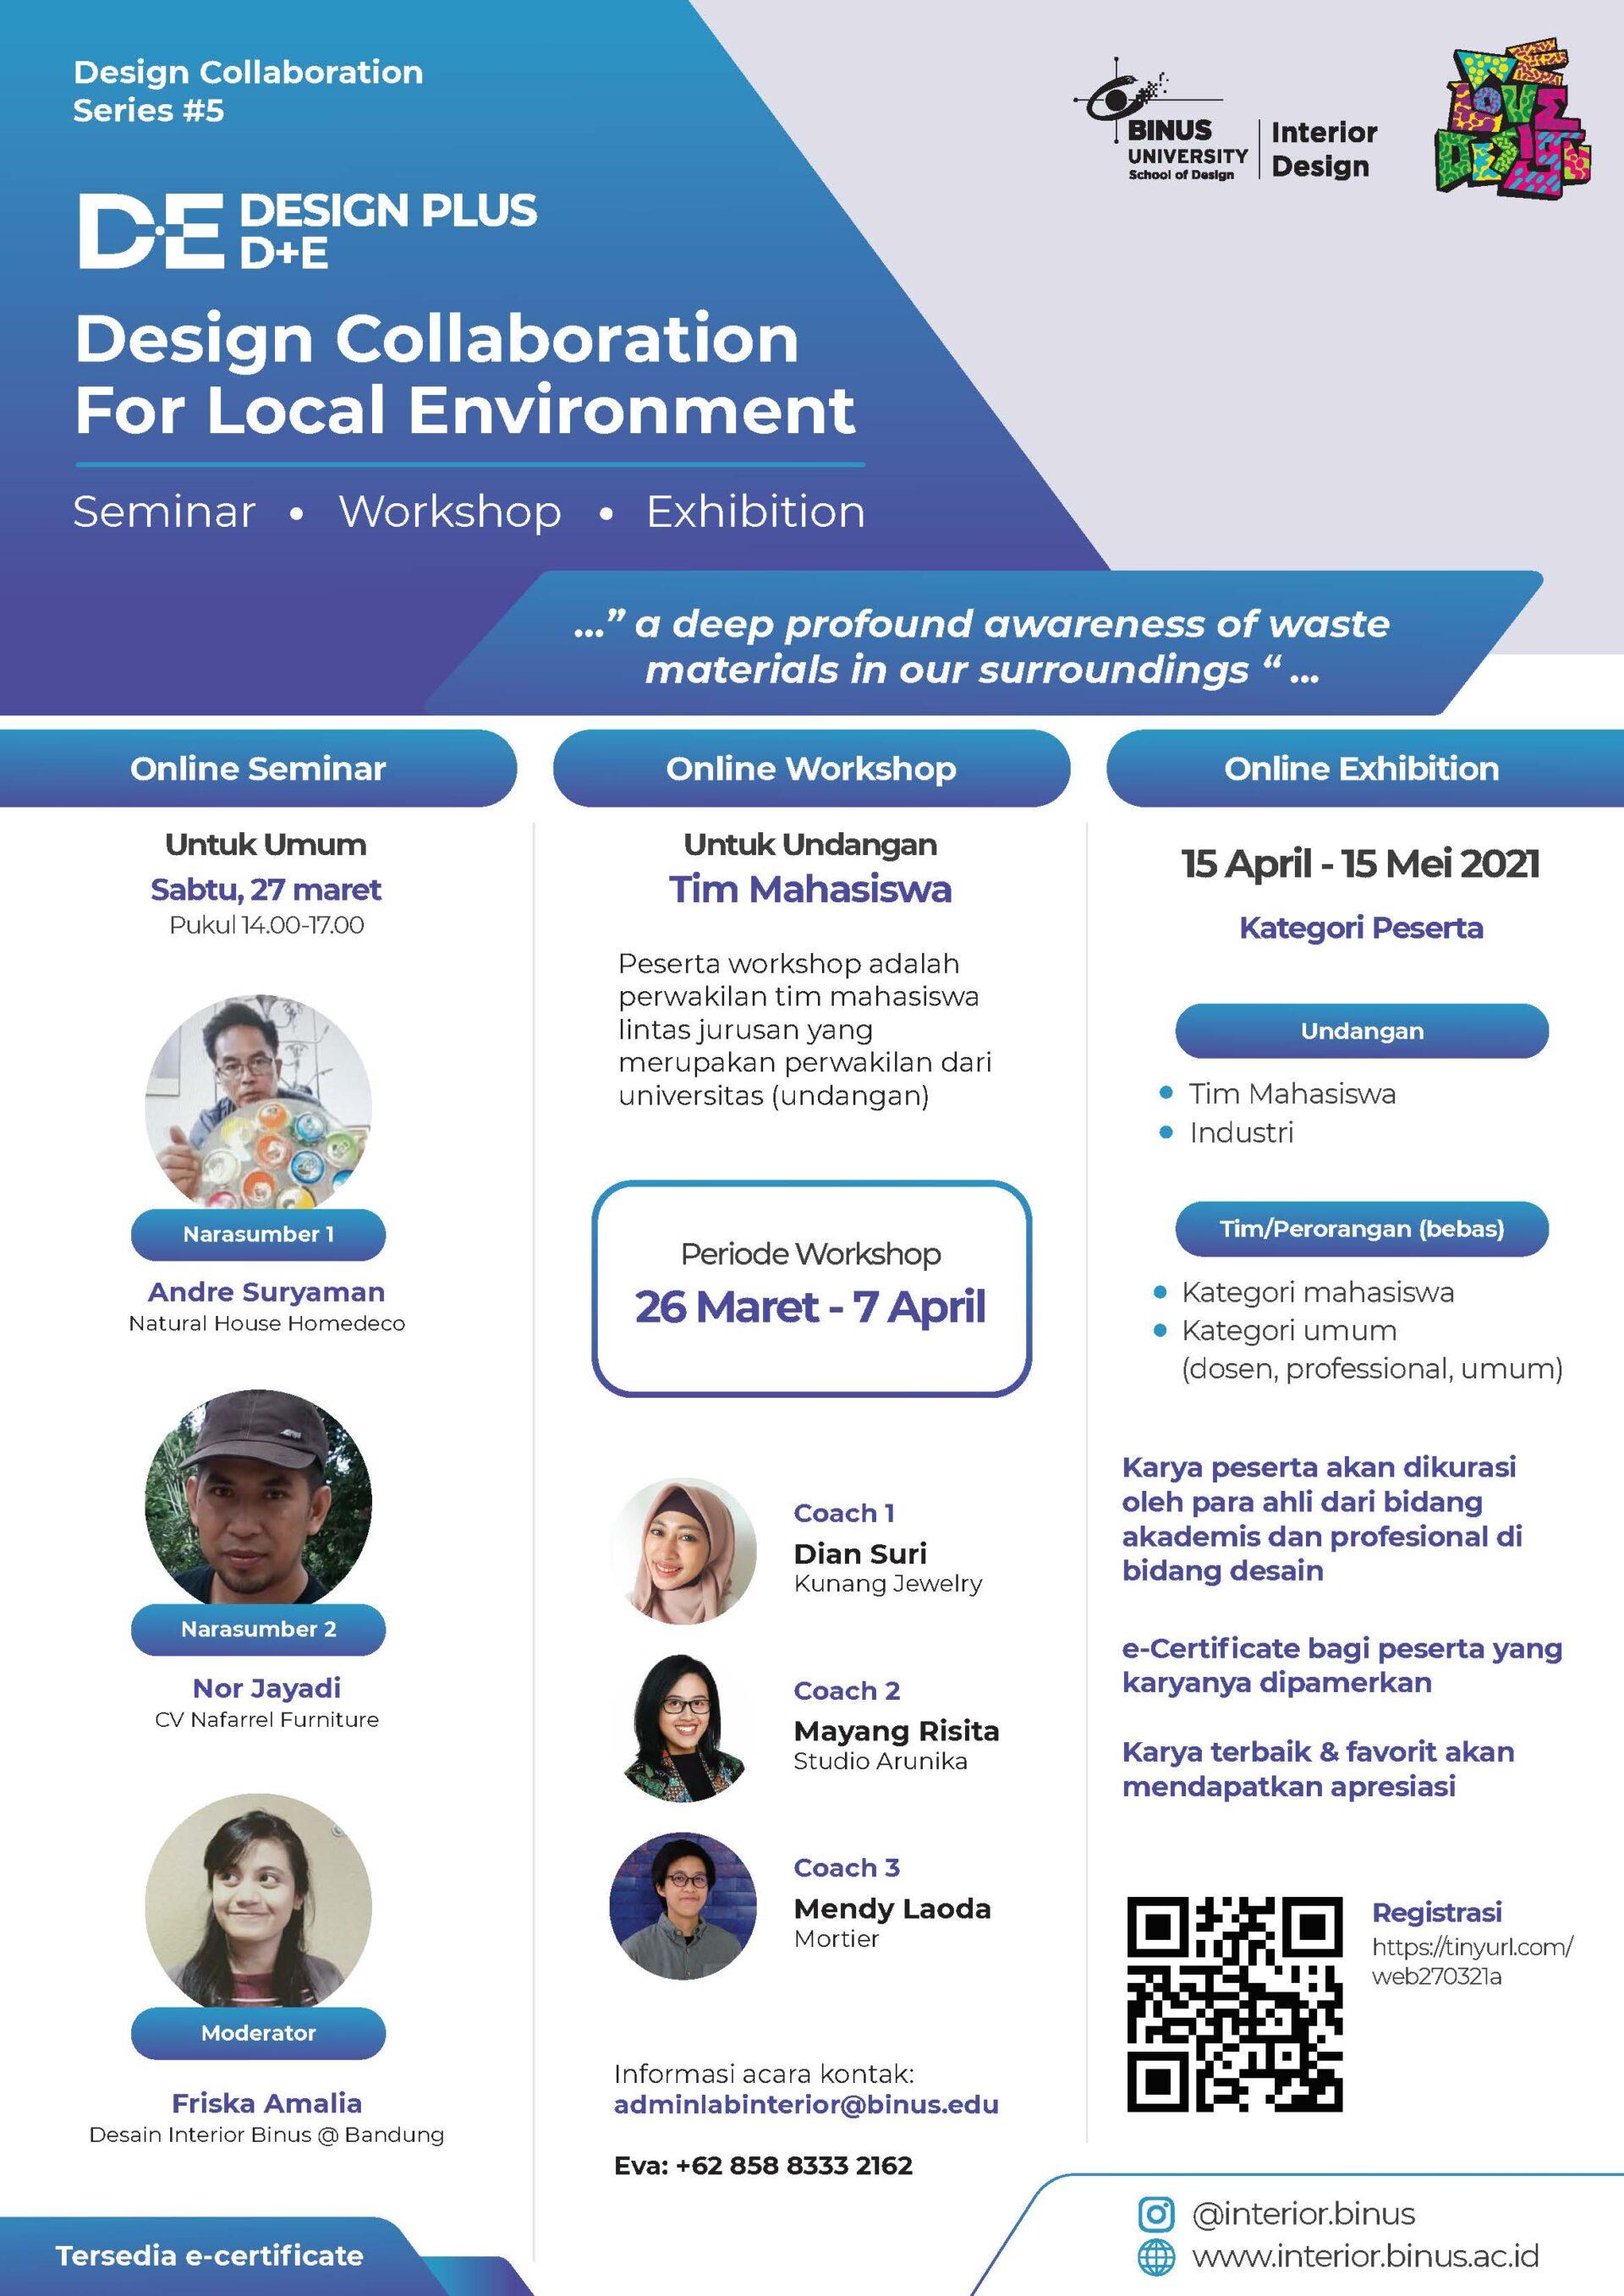 D+E DESIGN PLUS - Design Collaboration For Local Environment